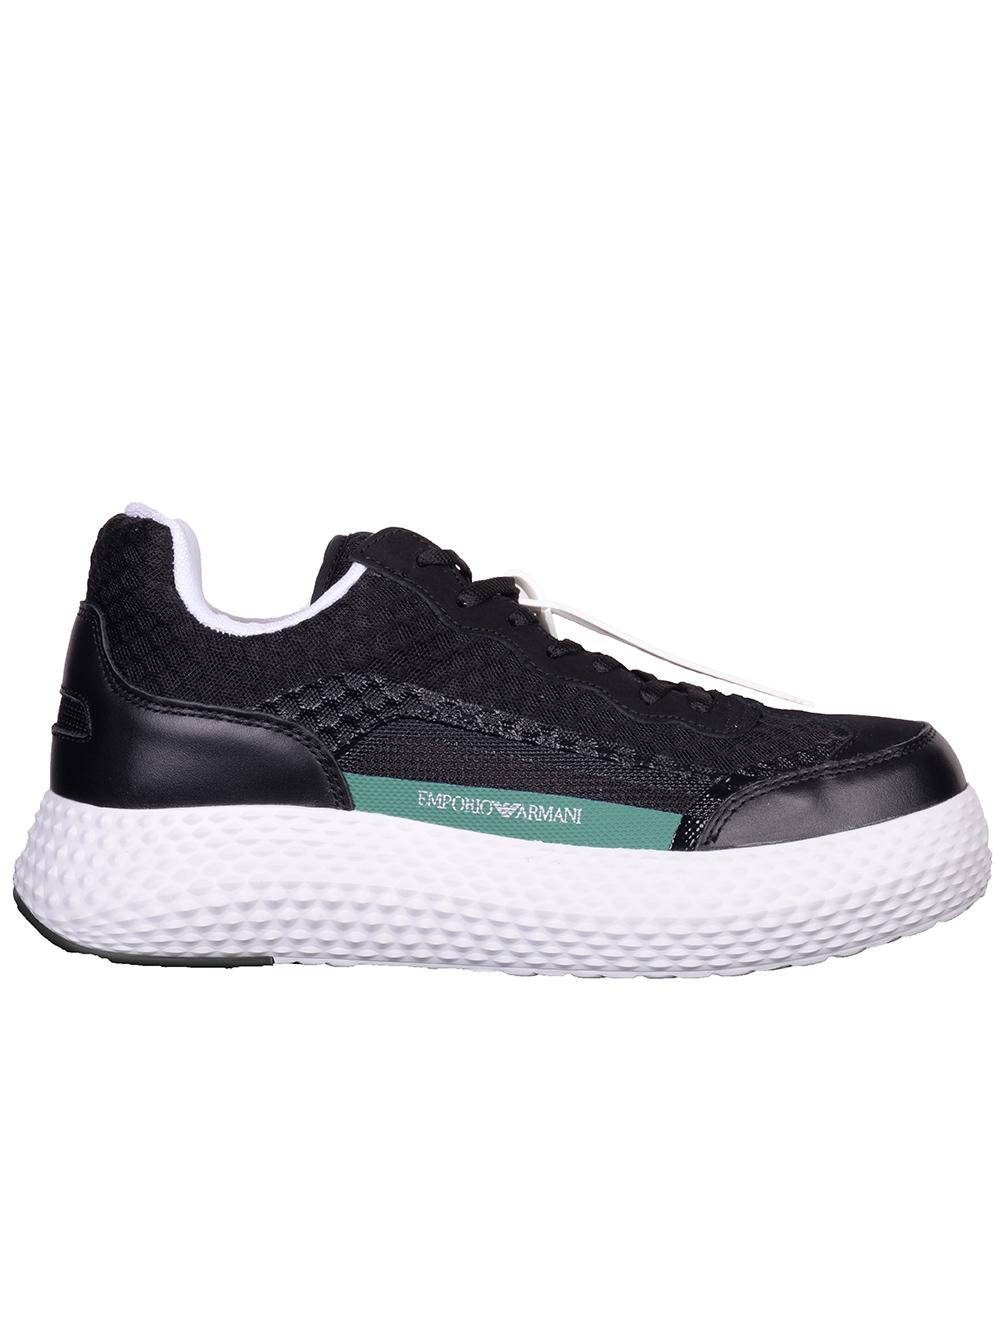 EMPORIO ARMANI Παπούτσια Sneakers X4X269 XM233-789 ΜΑΥΡΟ